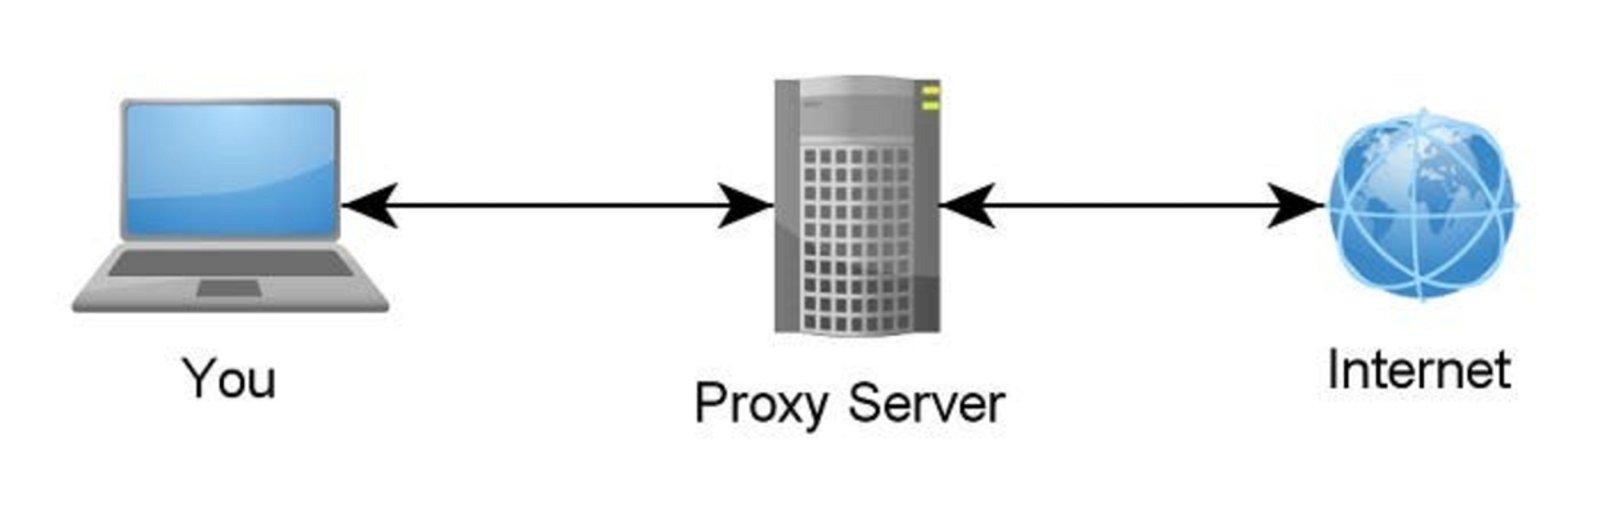 proxy-server